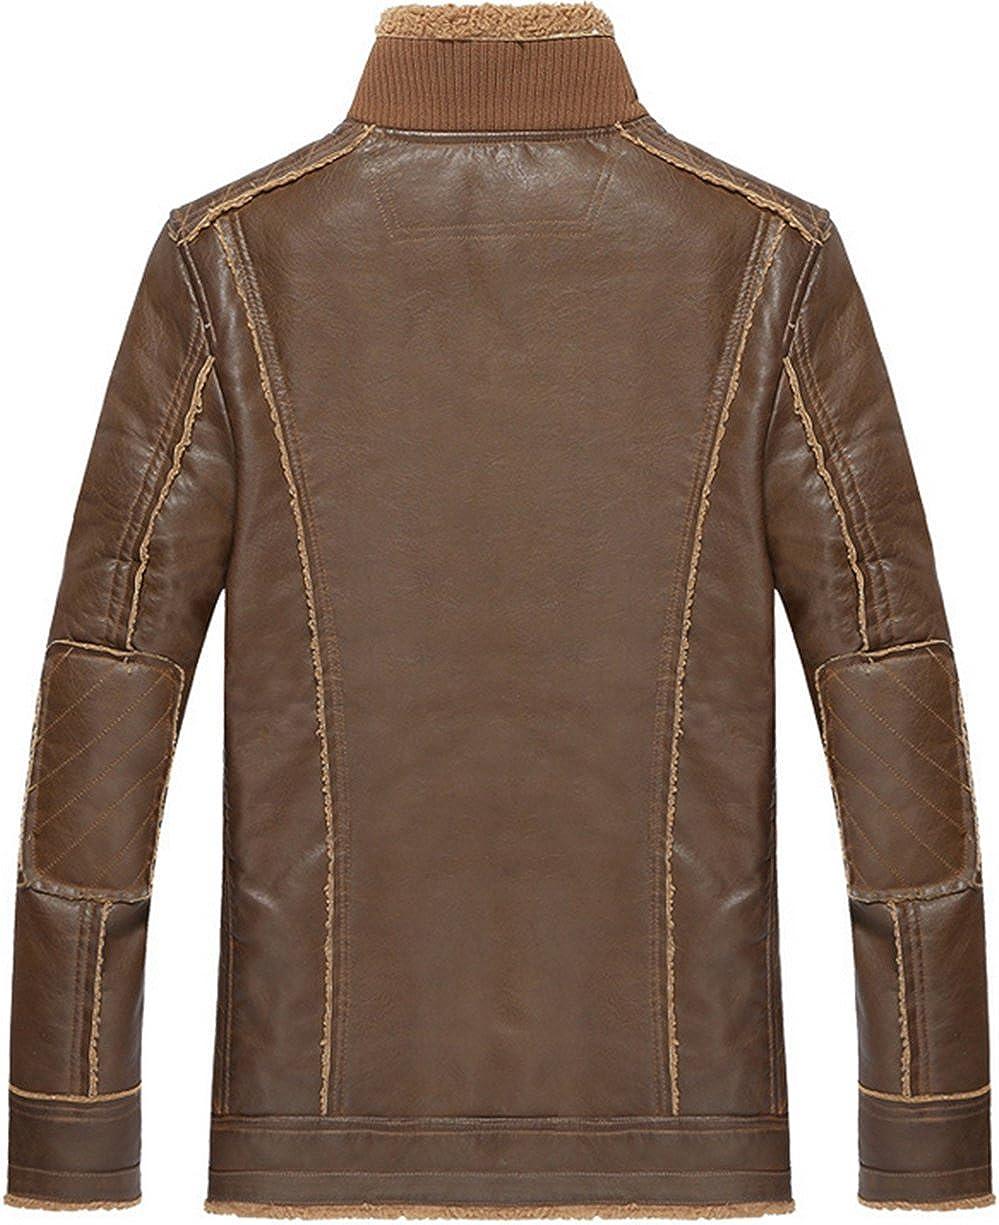 Jinmen Mens Aviator Retro Faux Leather Bomber Flying Jacket Lamb Wool Lining